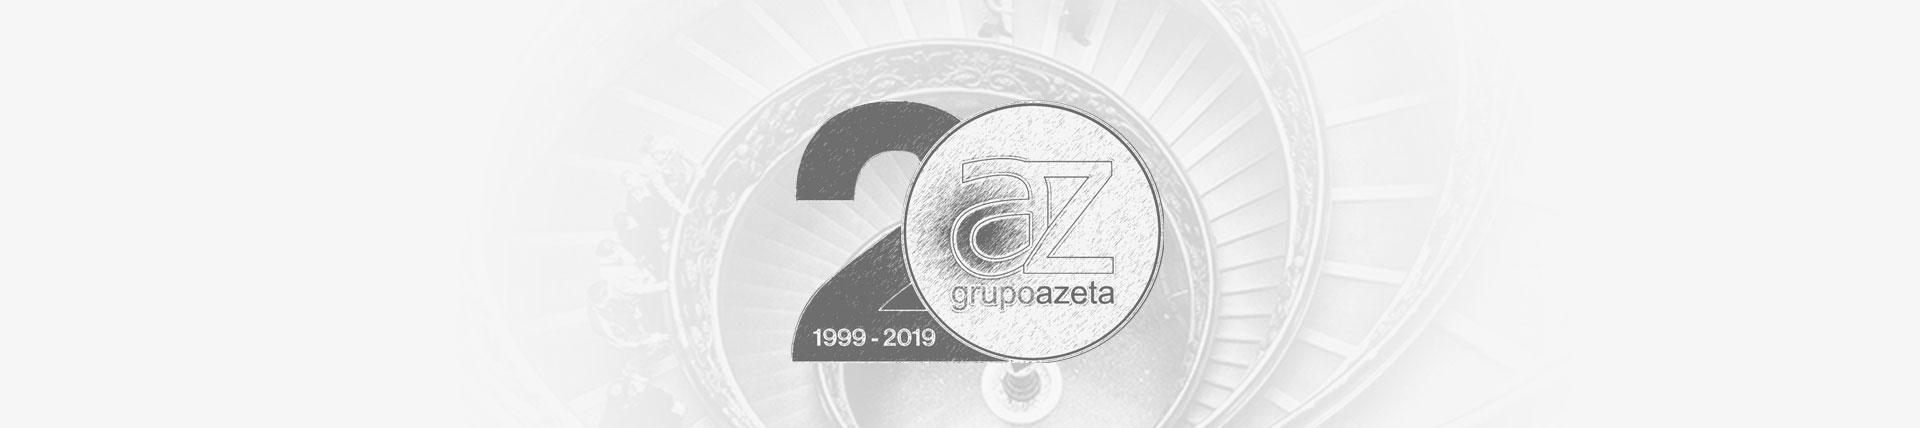 20 aniversario grupo azeta